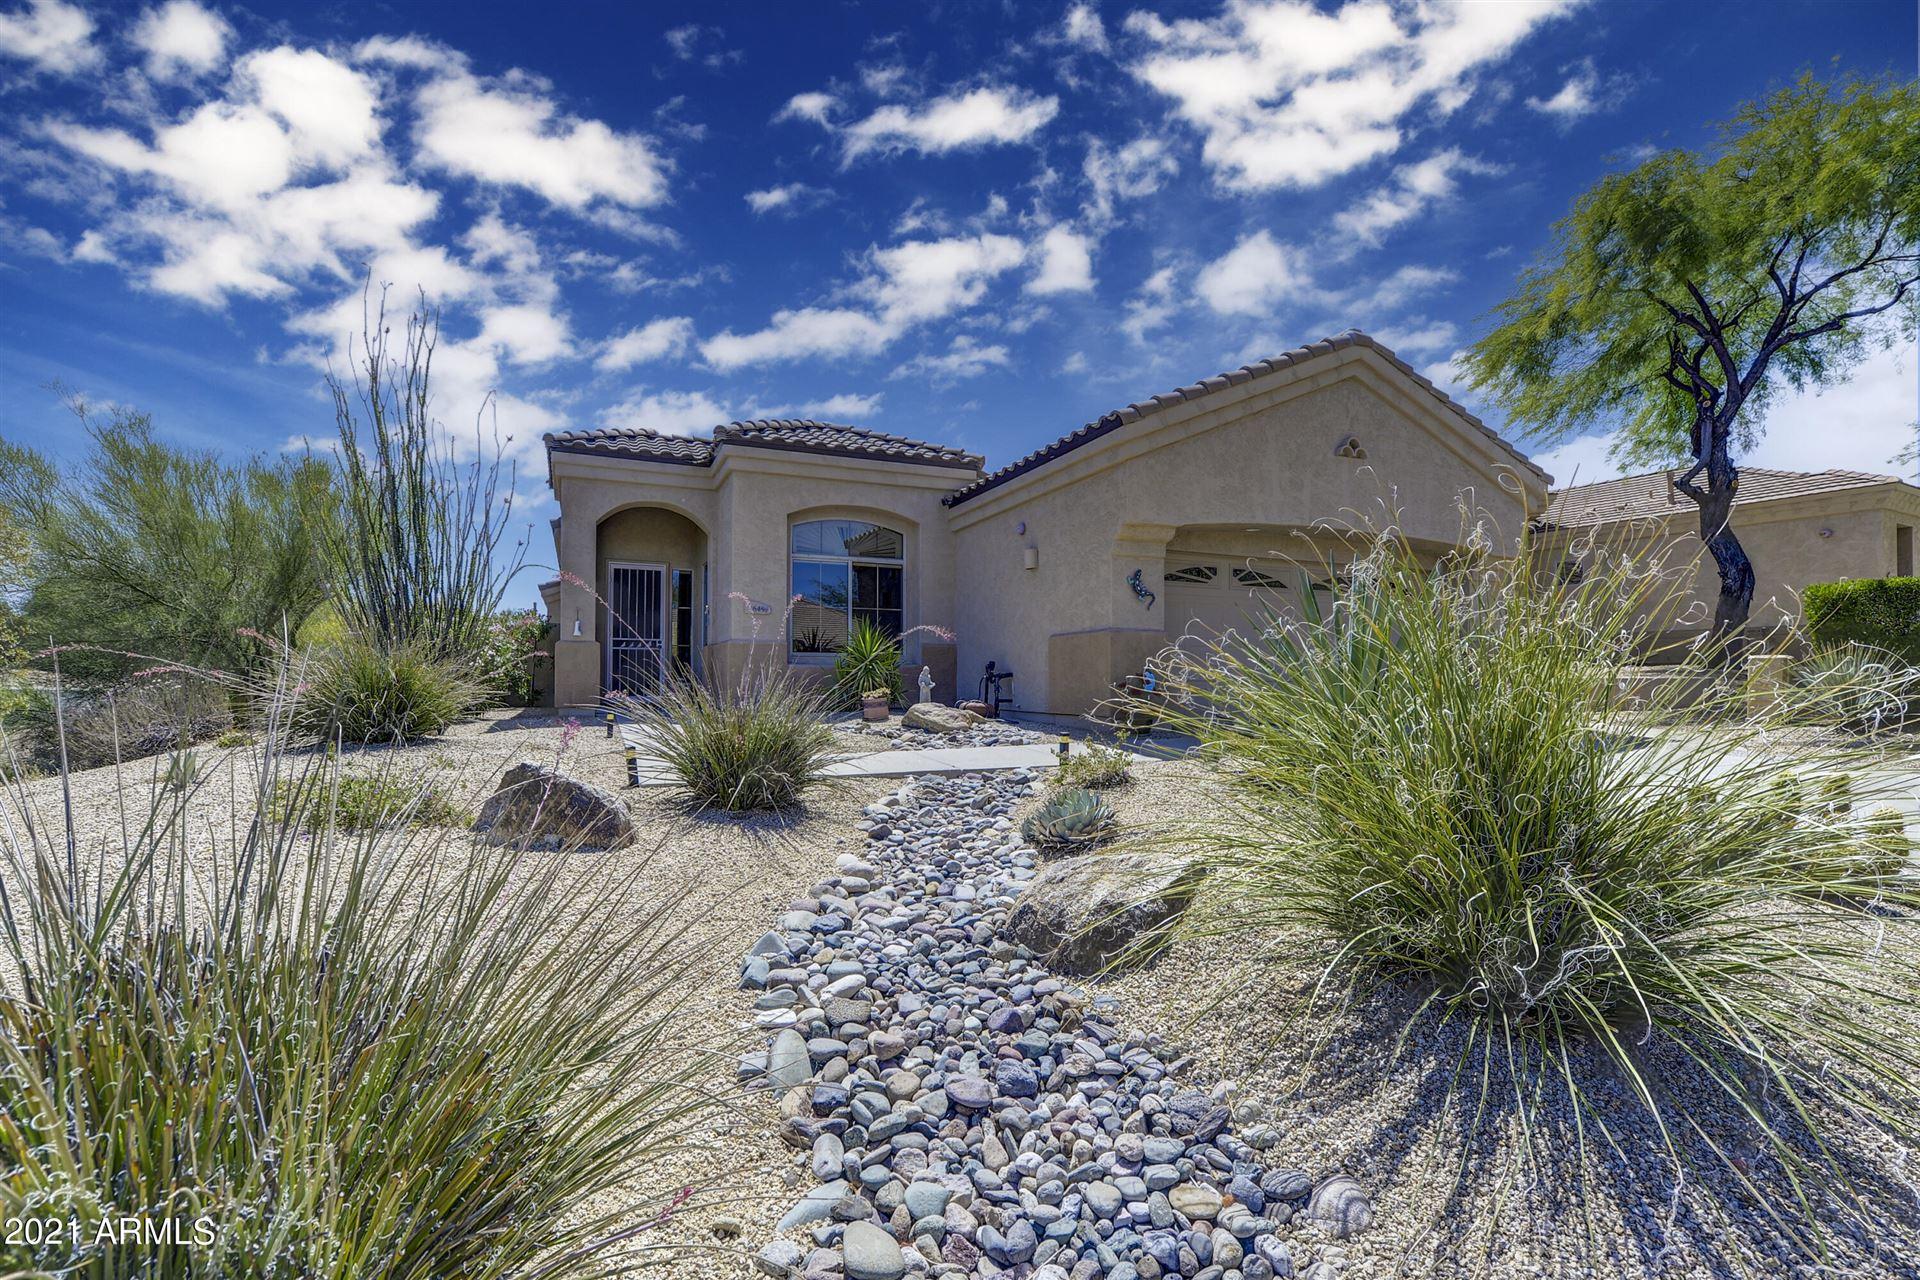 26459 N 115TH Way, Scottsdale, AZ 85255 - MLS#: 6248577